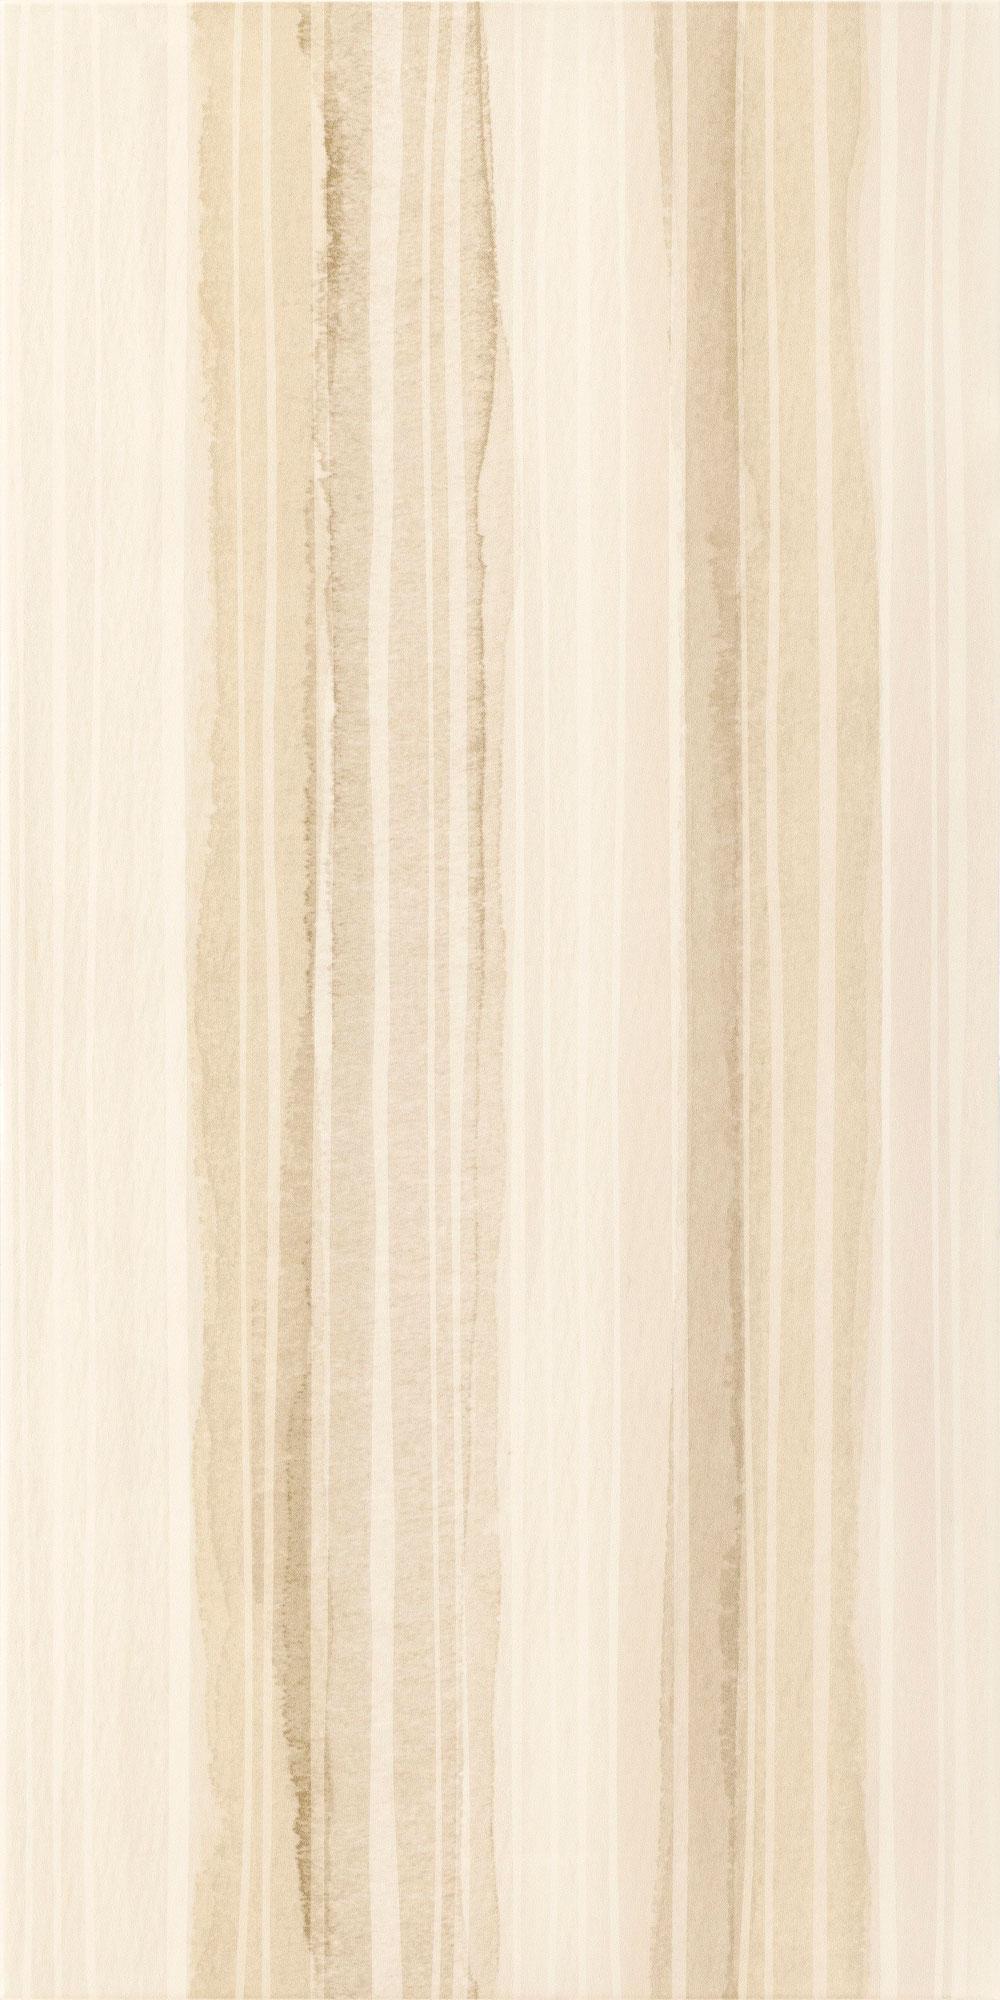 Настенная плитка Ceramika Paradyz Coraline Beige paski 30x60 (0,90) декор polcolorit dream beige caro 30x60